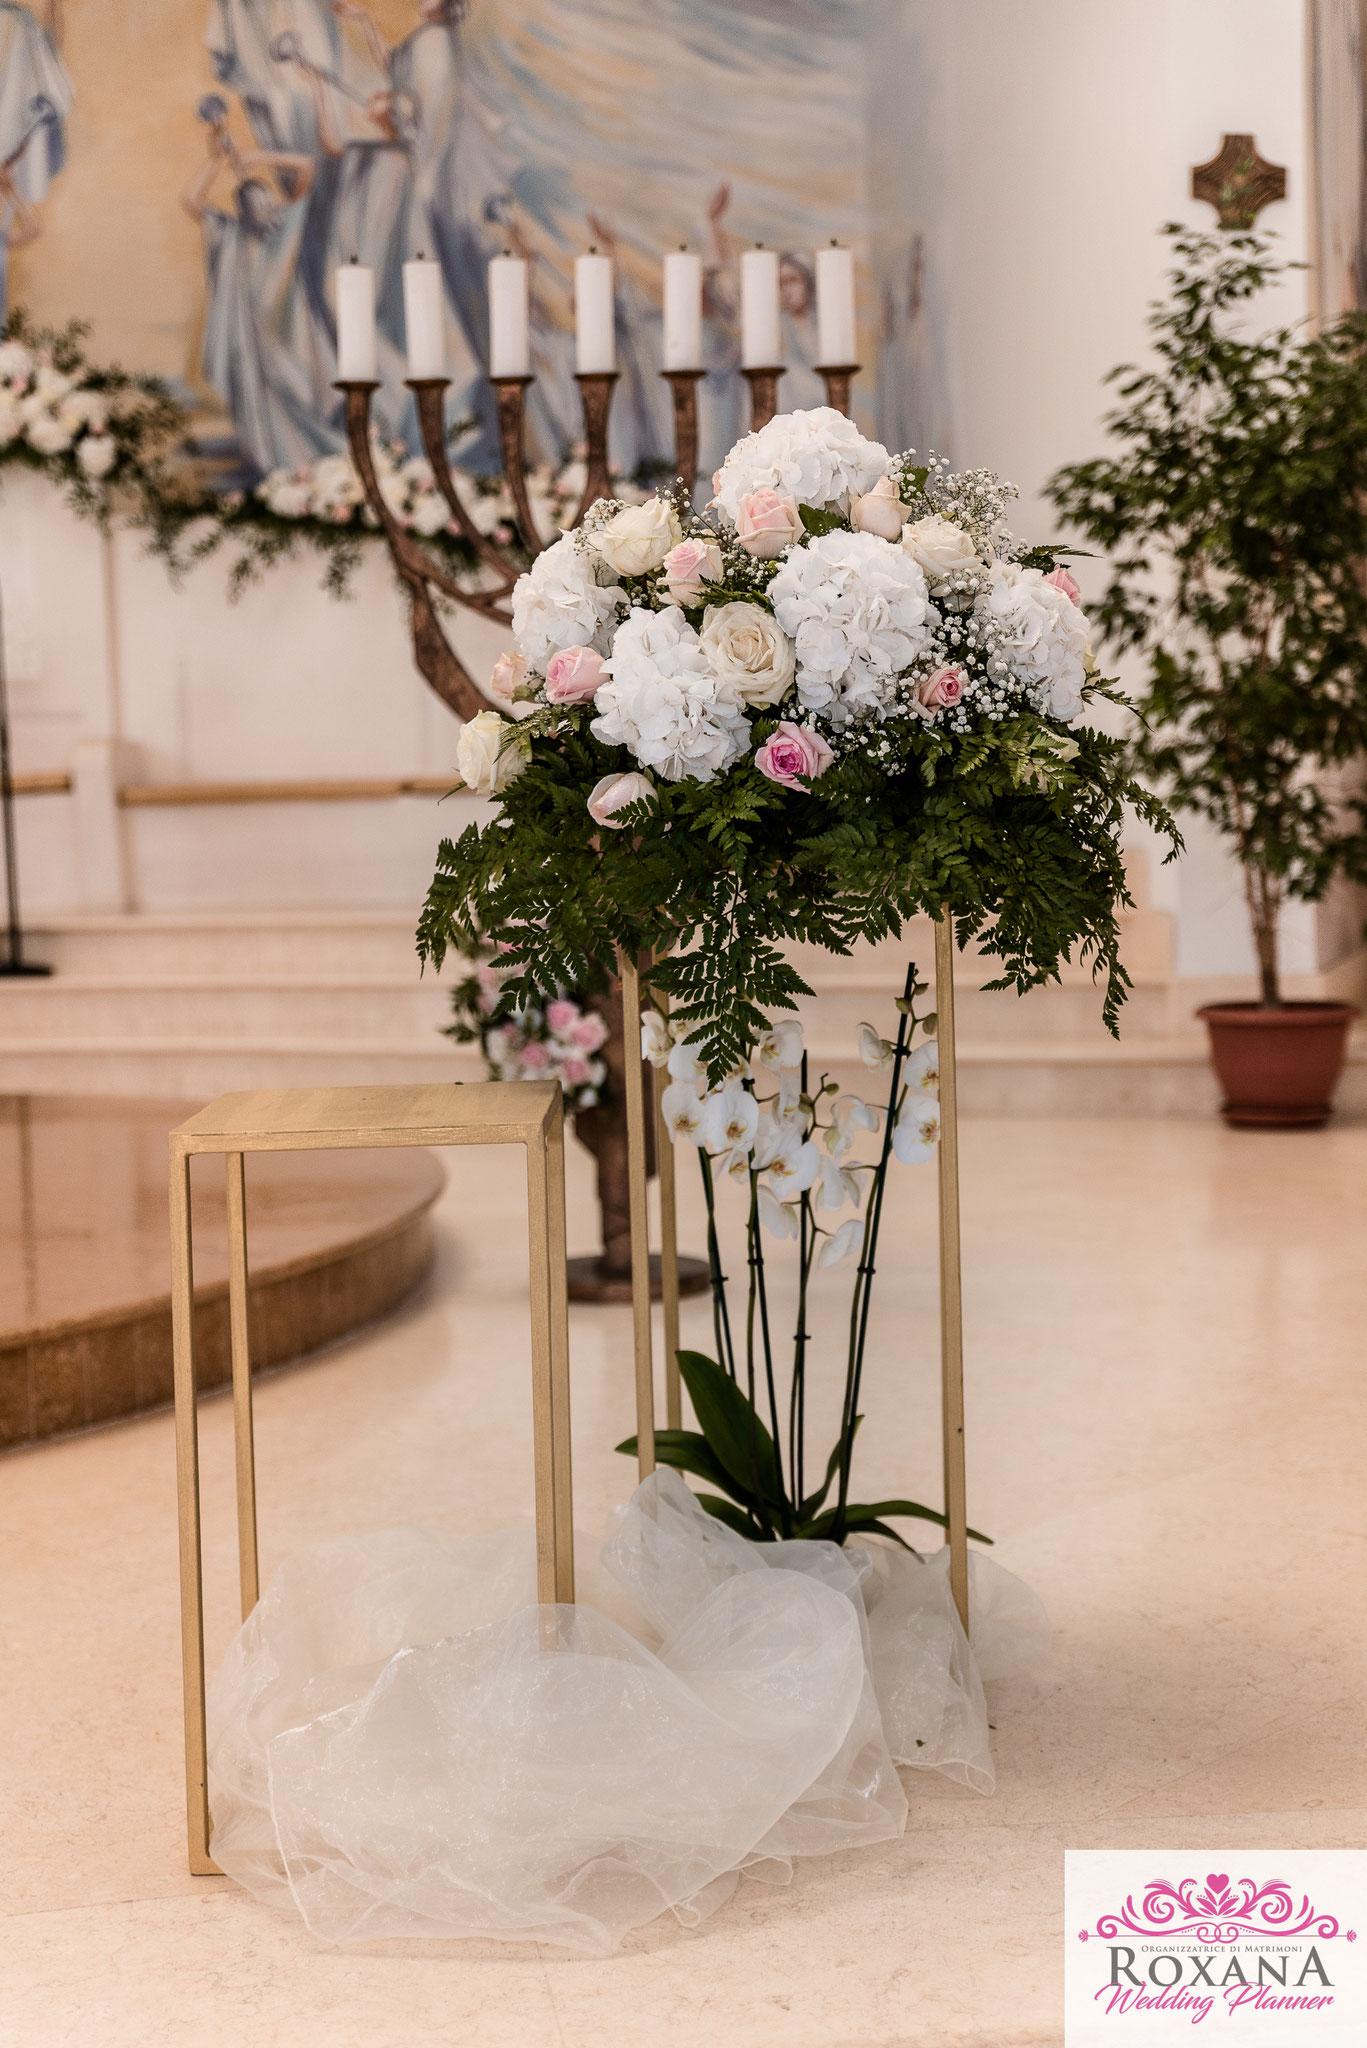 dettagli-allestimento-floreale-chiesa-matrimonio